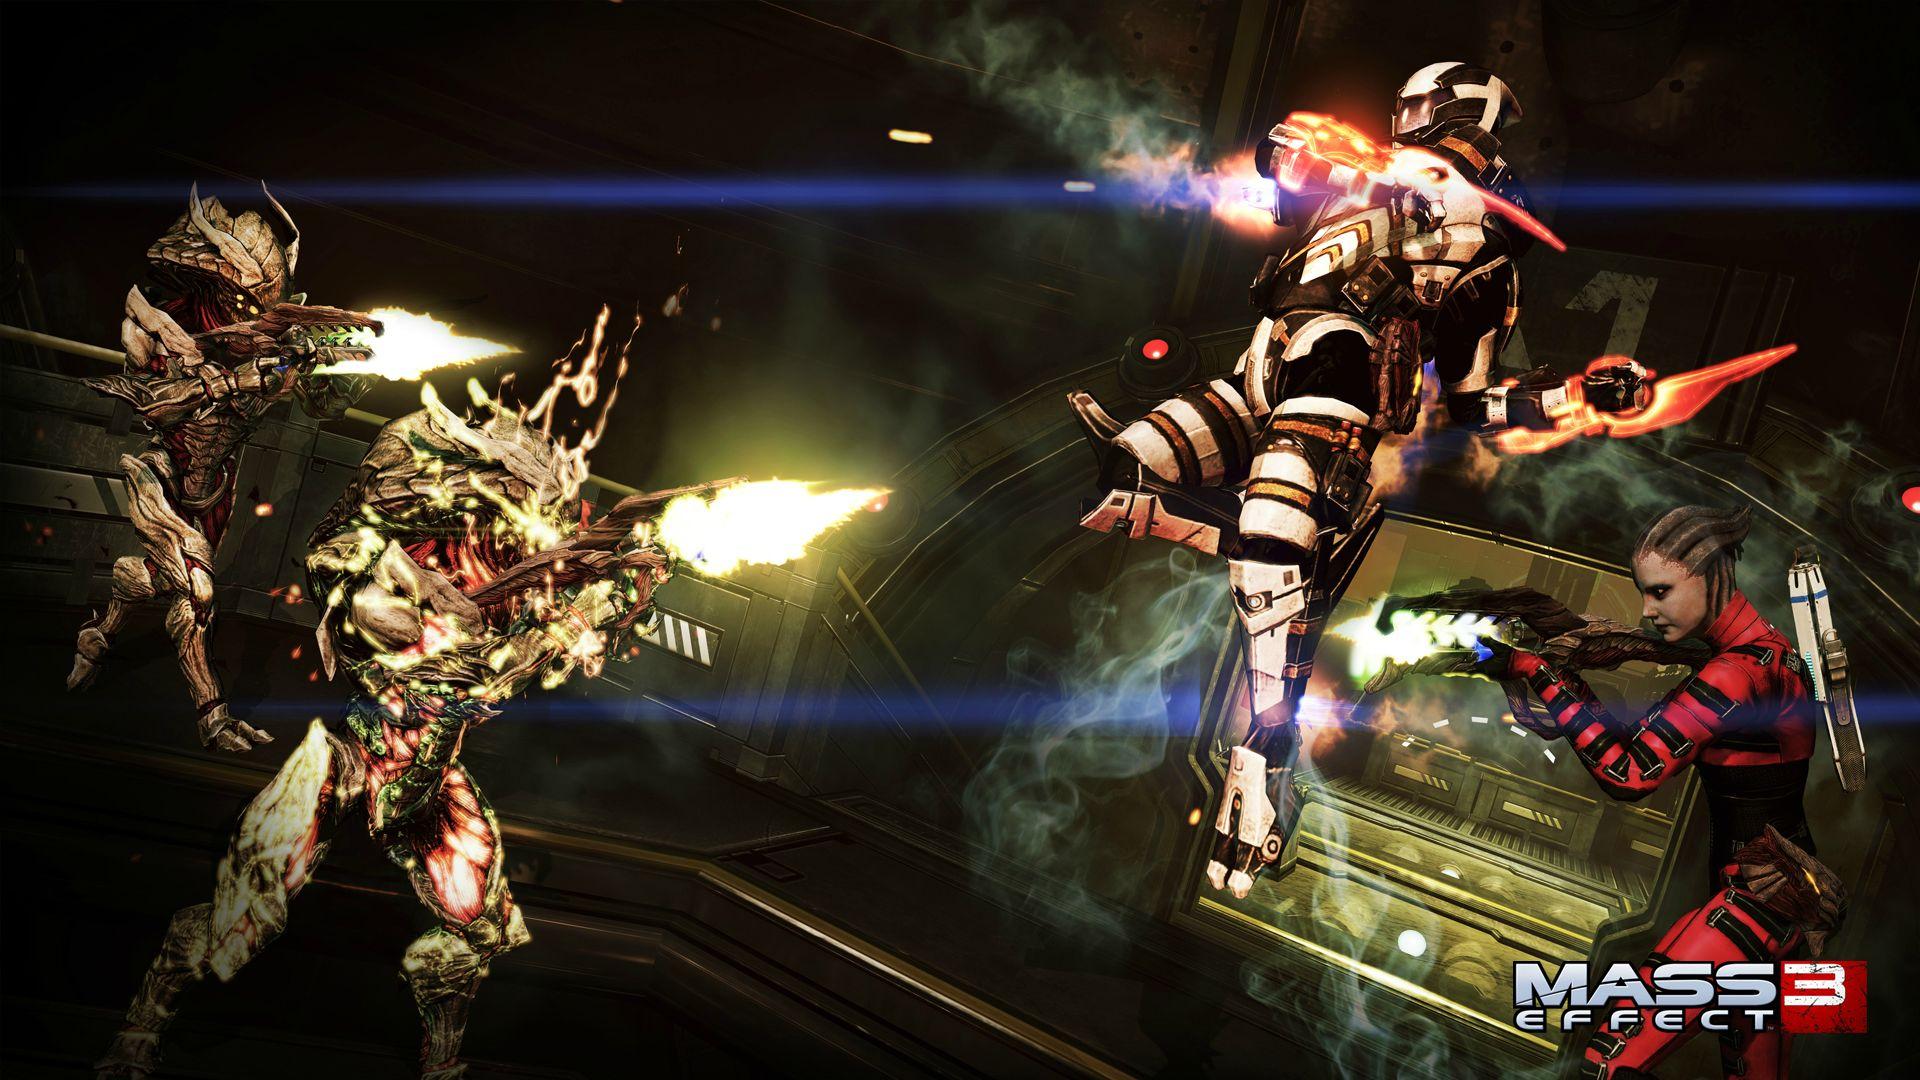 Mass Effect 3 chystá Retaliation DLC pro multiplayer 71167